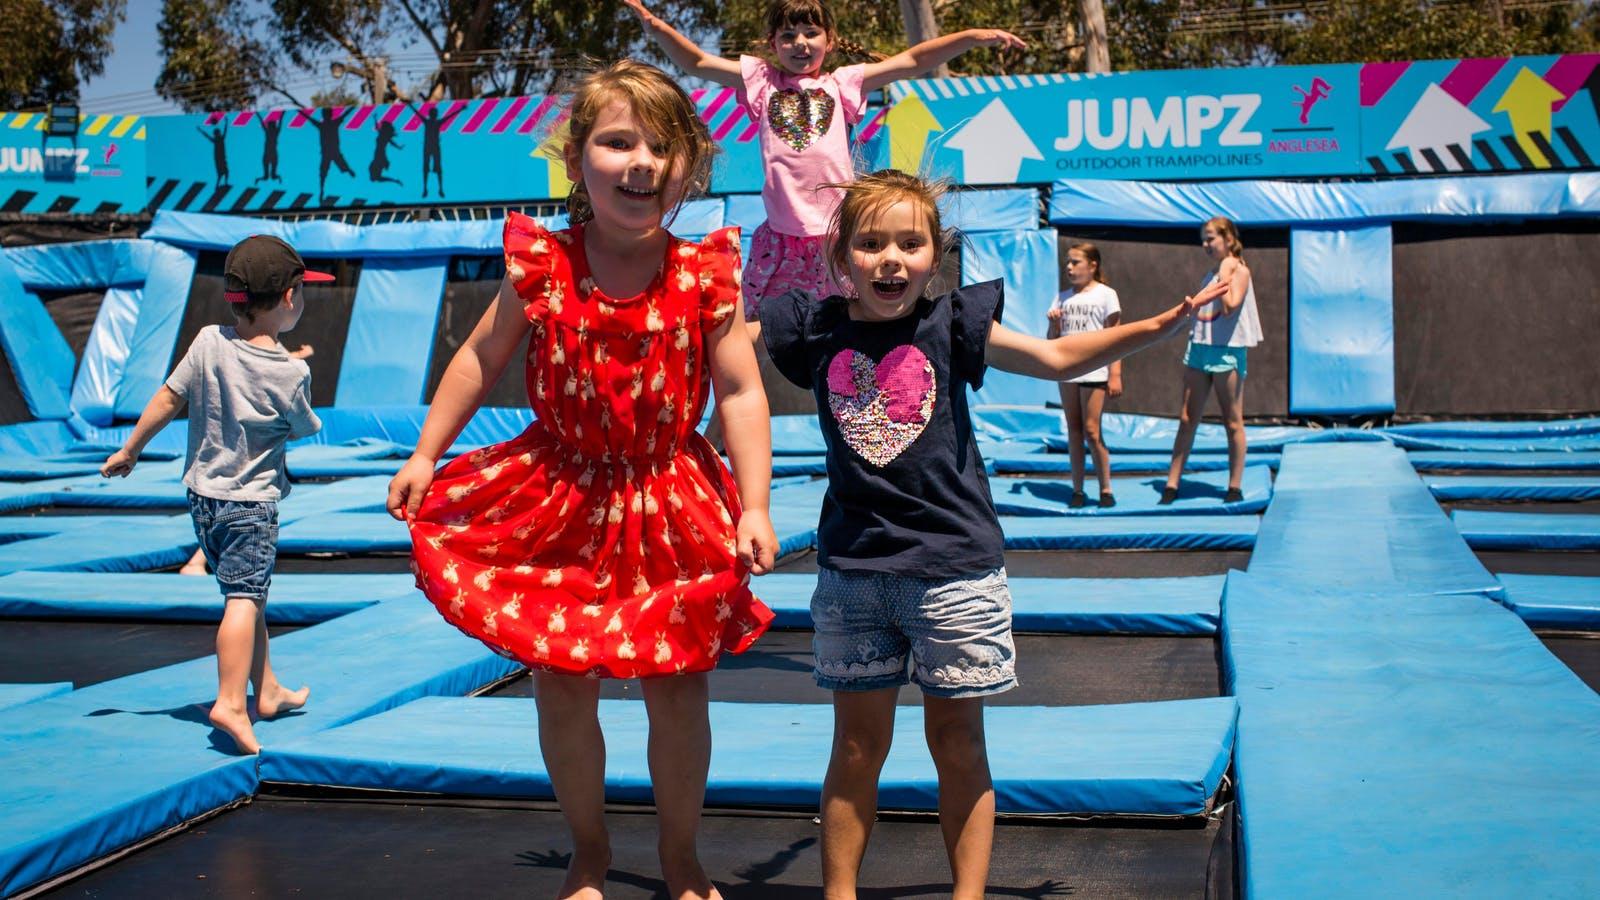 Jumpz Trampoline Park Anglesea